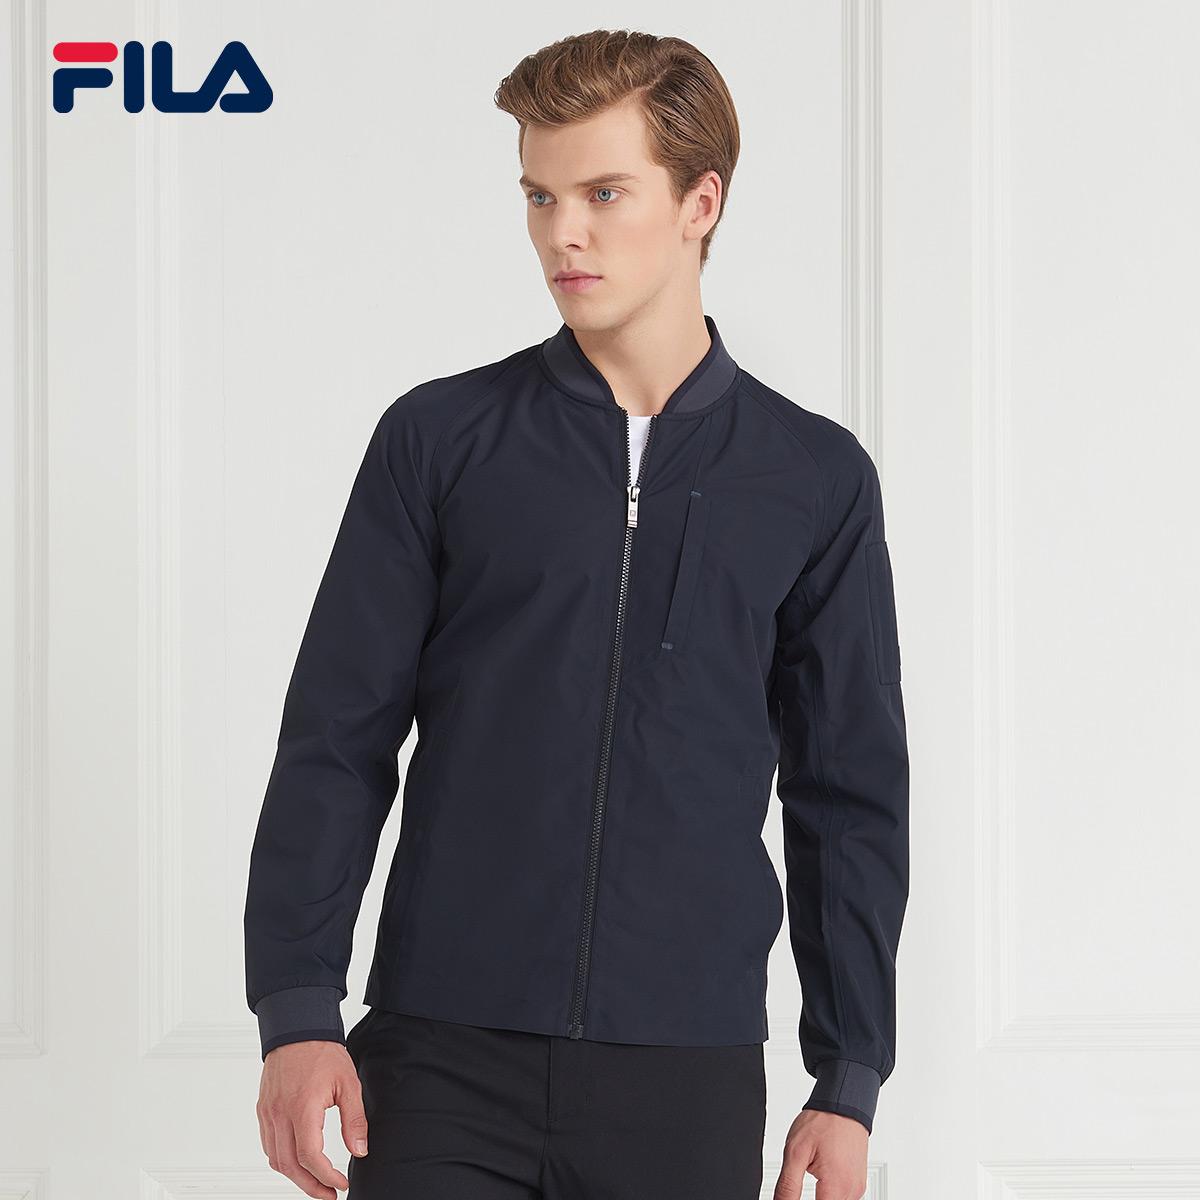 FILA斐乐外套男2018秋季新品高端商务休闲简约梭织运动外套男上衣